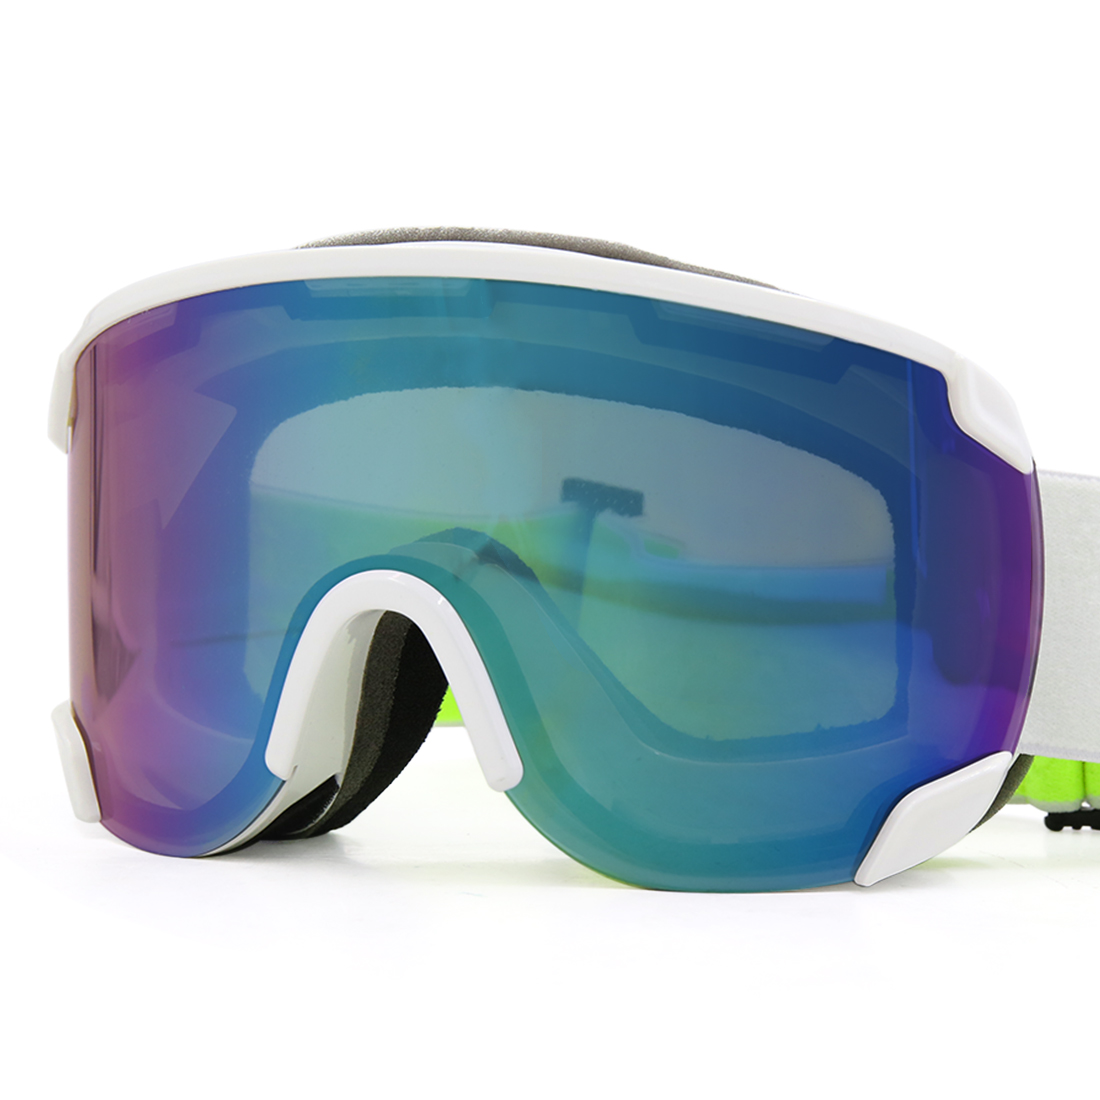 LY-100 Authorized Ski Snowboard Goggles Anti-fog UV400 Protect OTG Glasses Anti-slip by Unique-Bargains